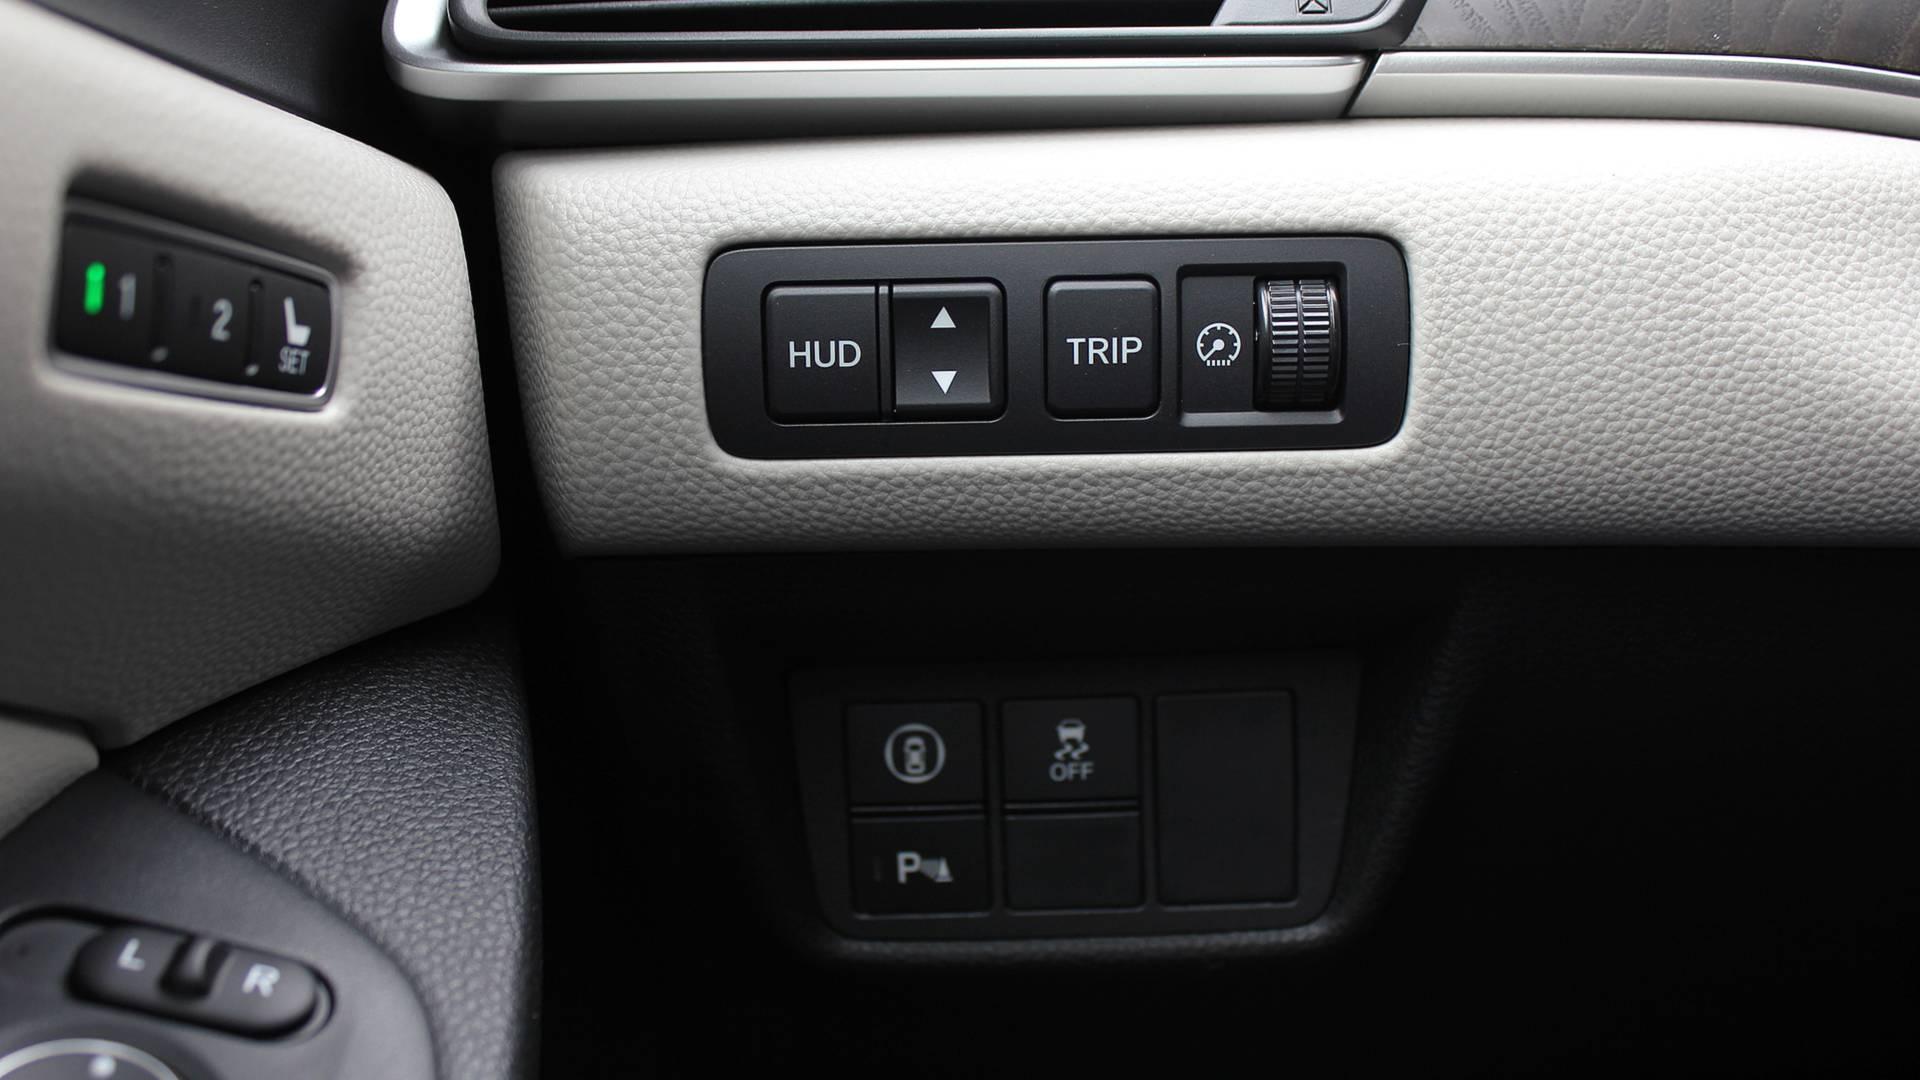 2018-honda-accord-hybrid-danh-gia-11.jpg